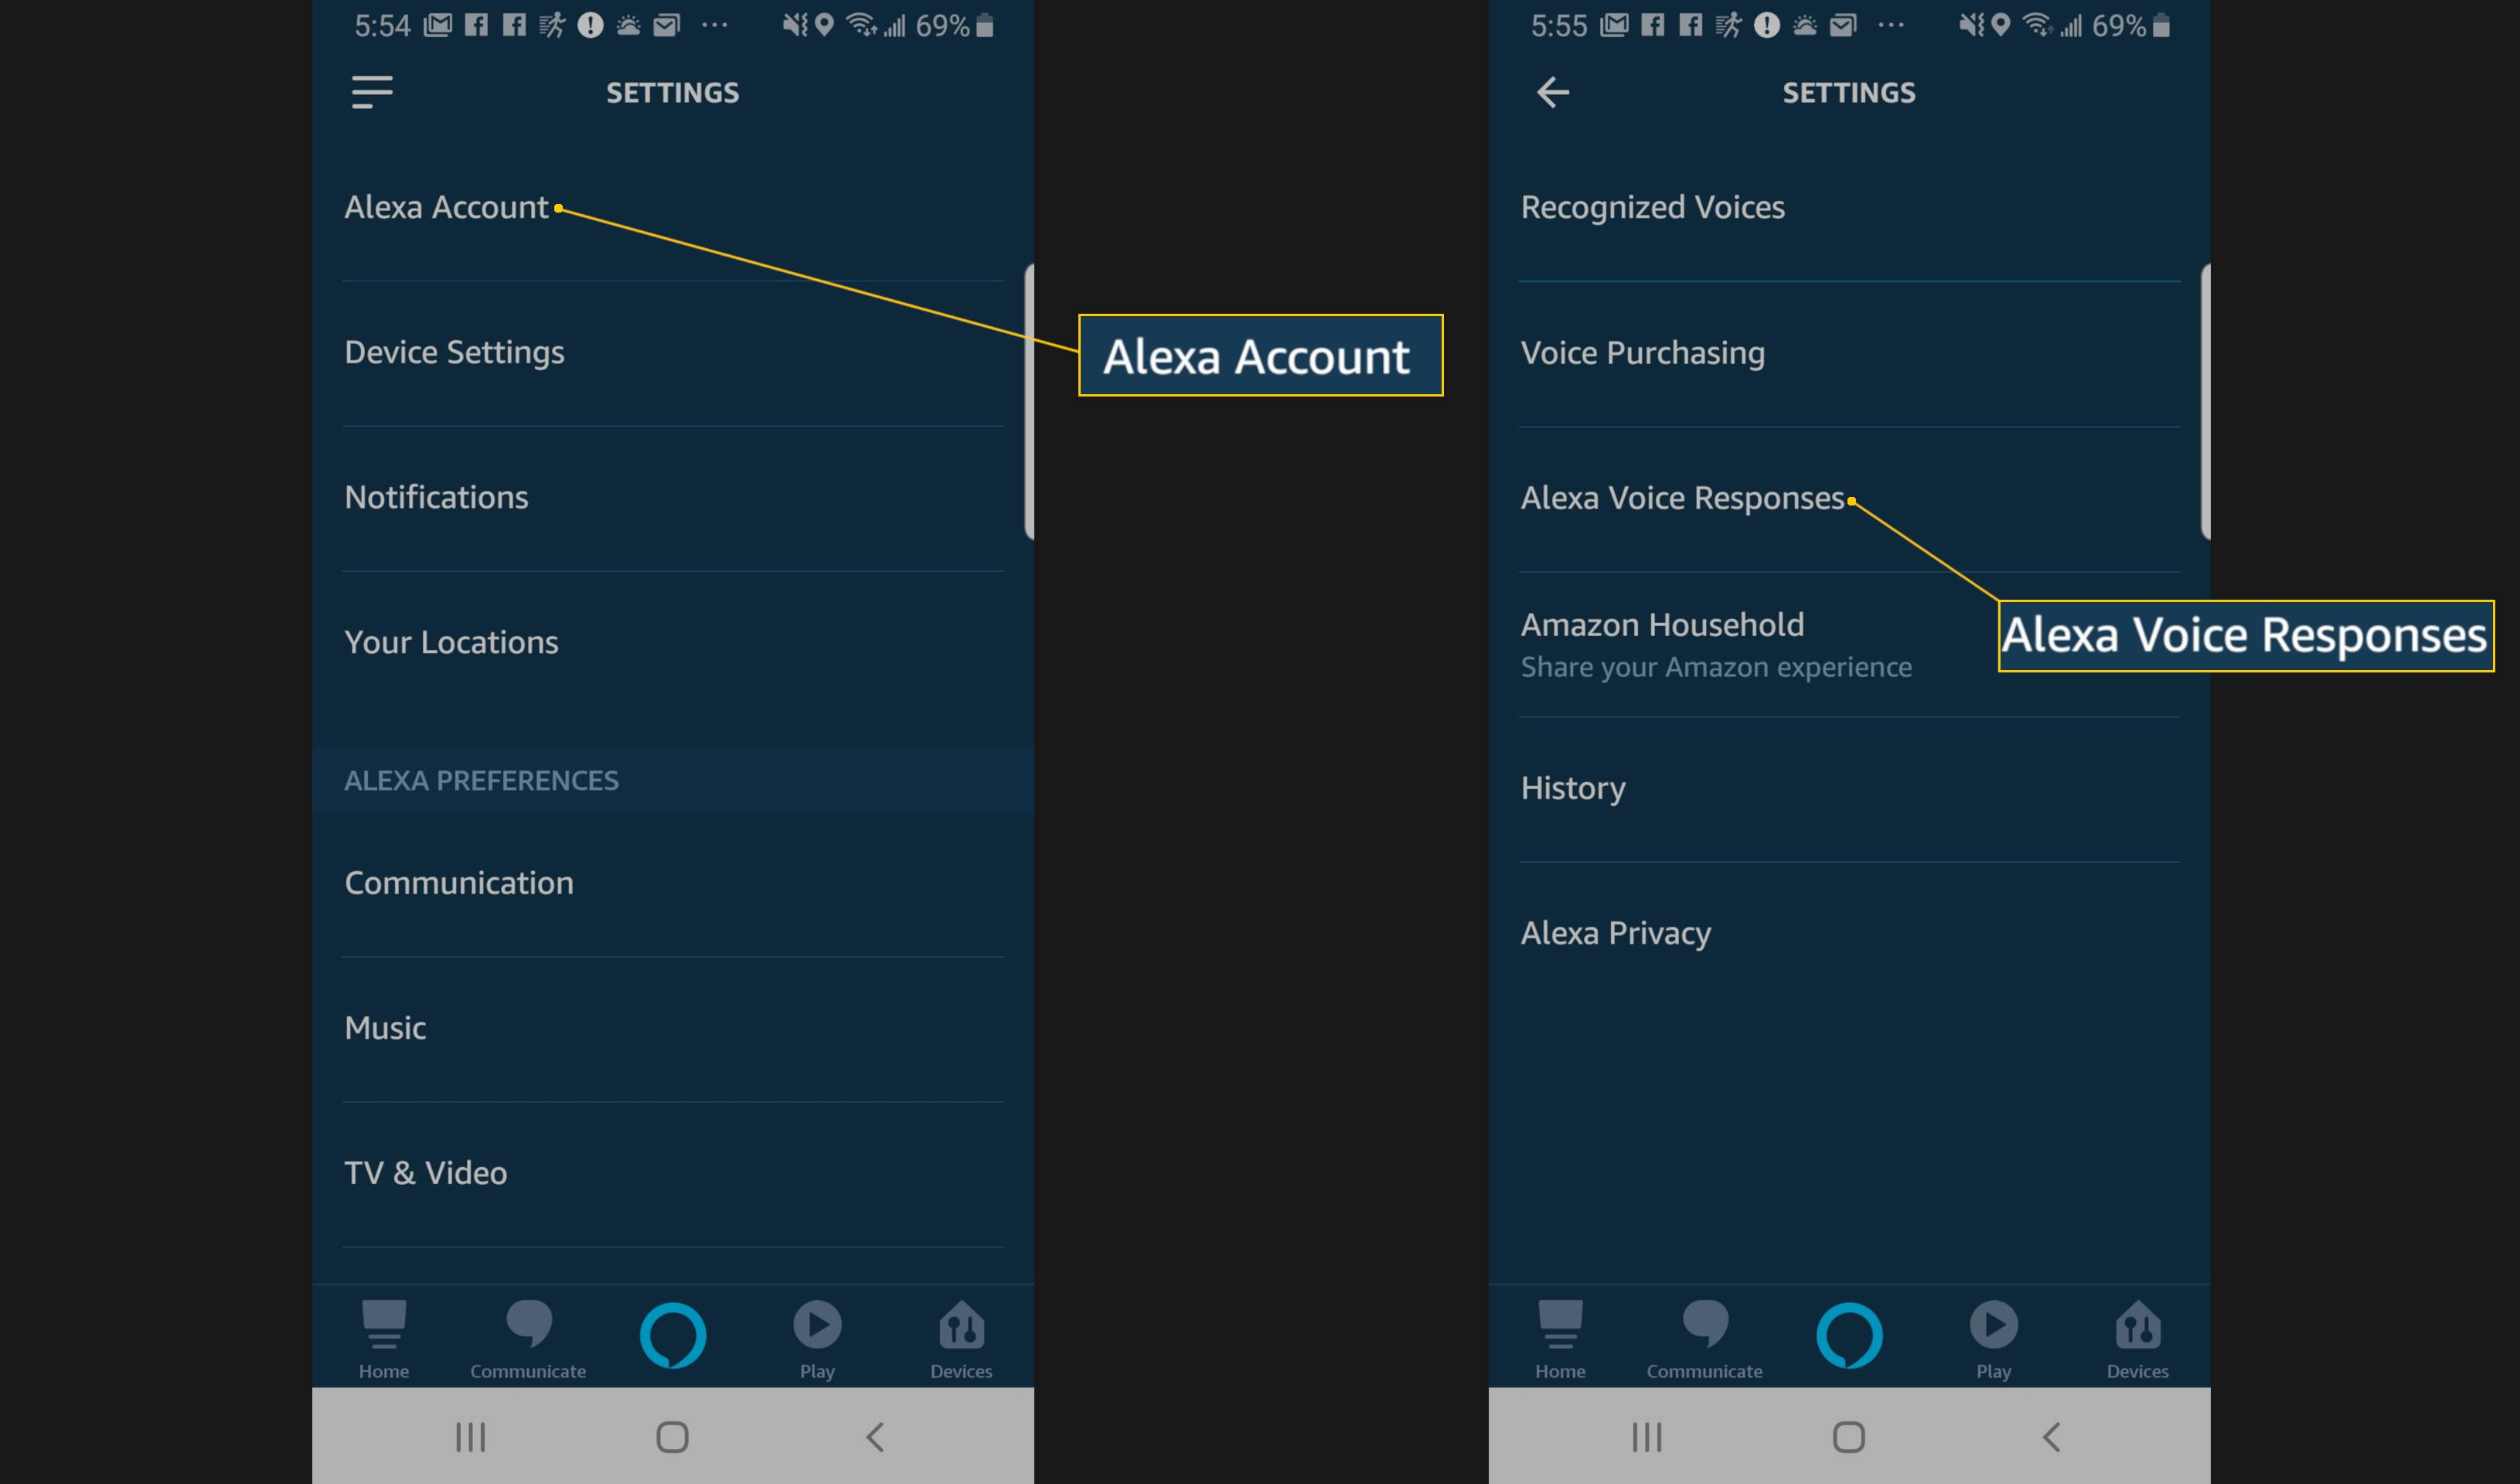 Screenshot of navigating to the Alexa Voice Responses setting.